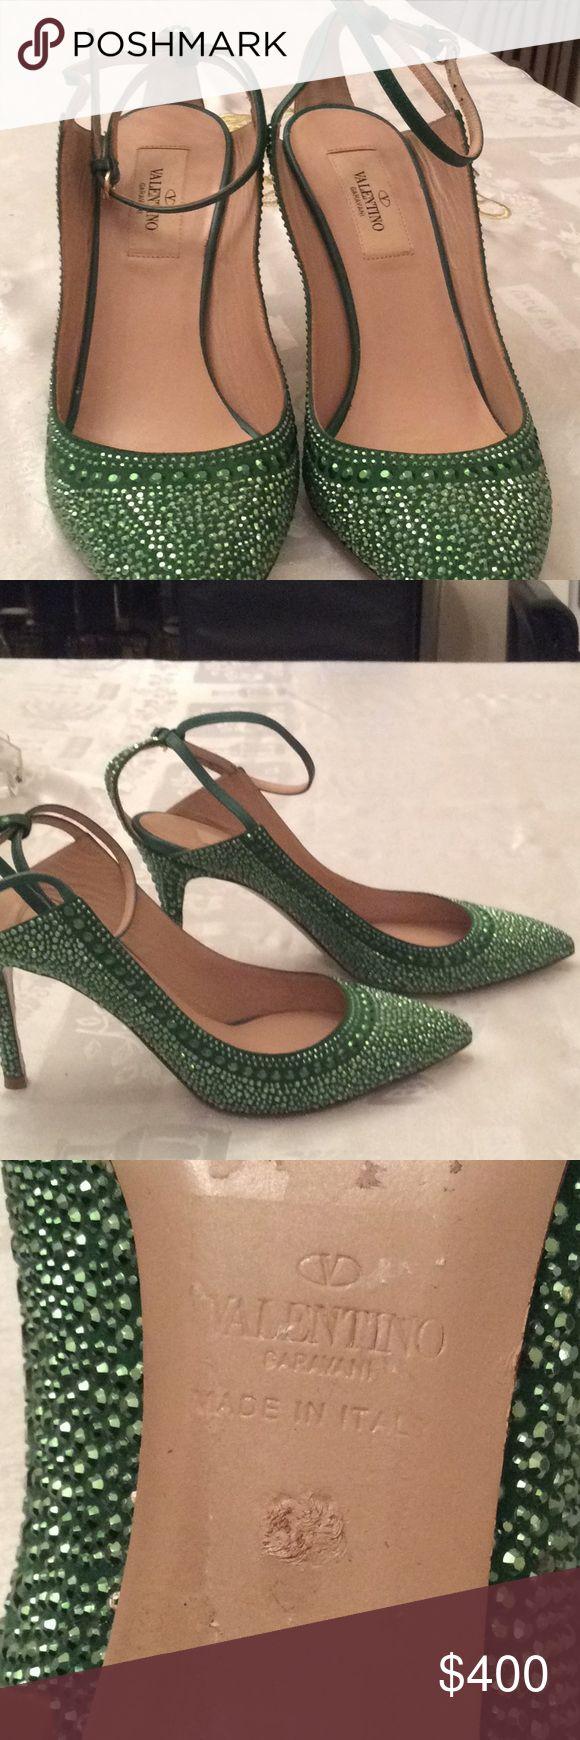 NWOB Valentino studs heel Gorgeous green studs pumps by Valentino Garavani.  Ankle strap, t-back high heels... Size 37. Valentino Shoes Heels